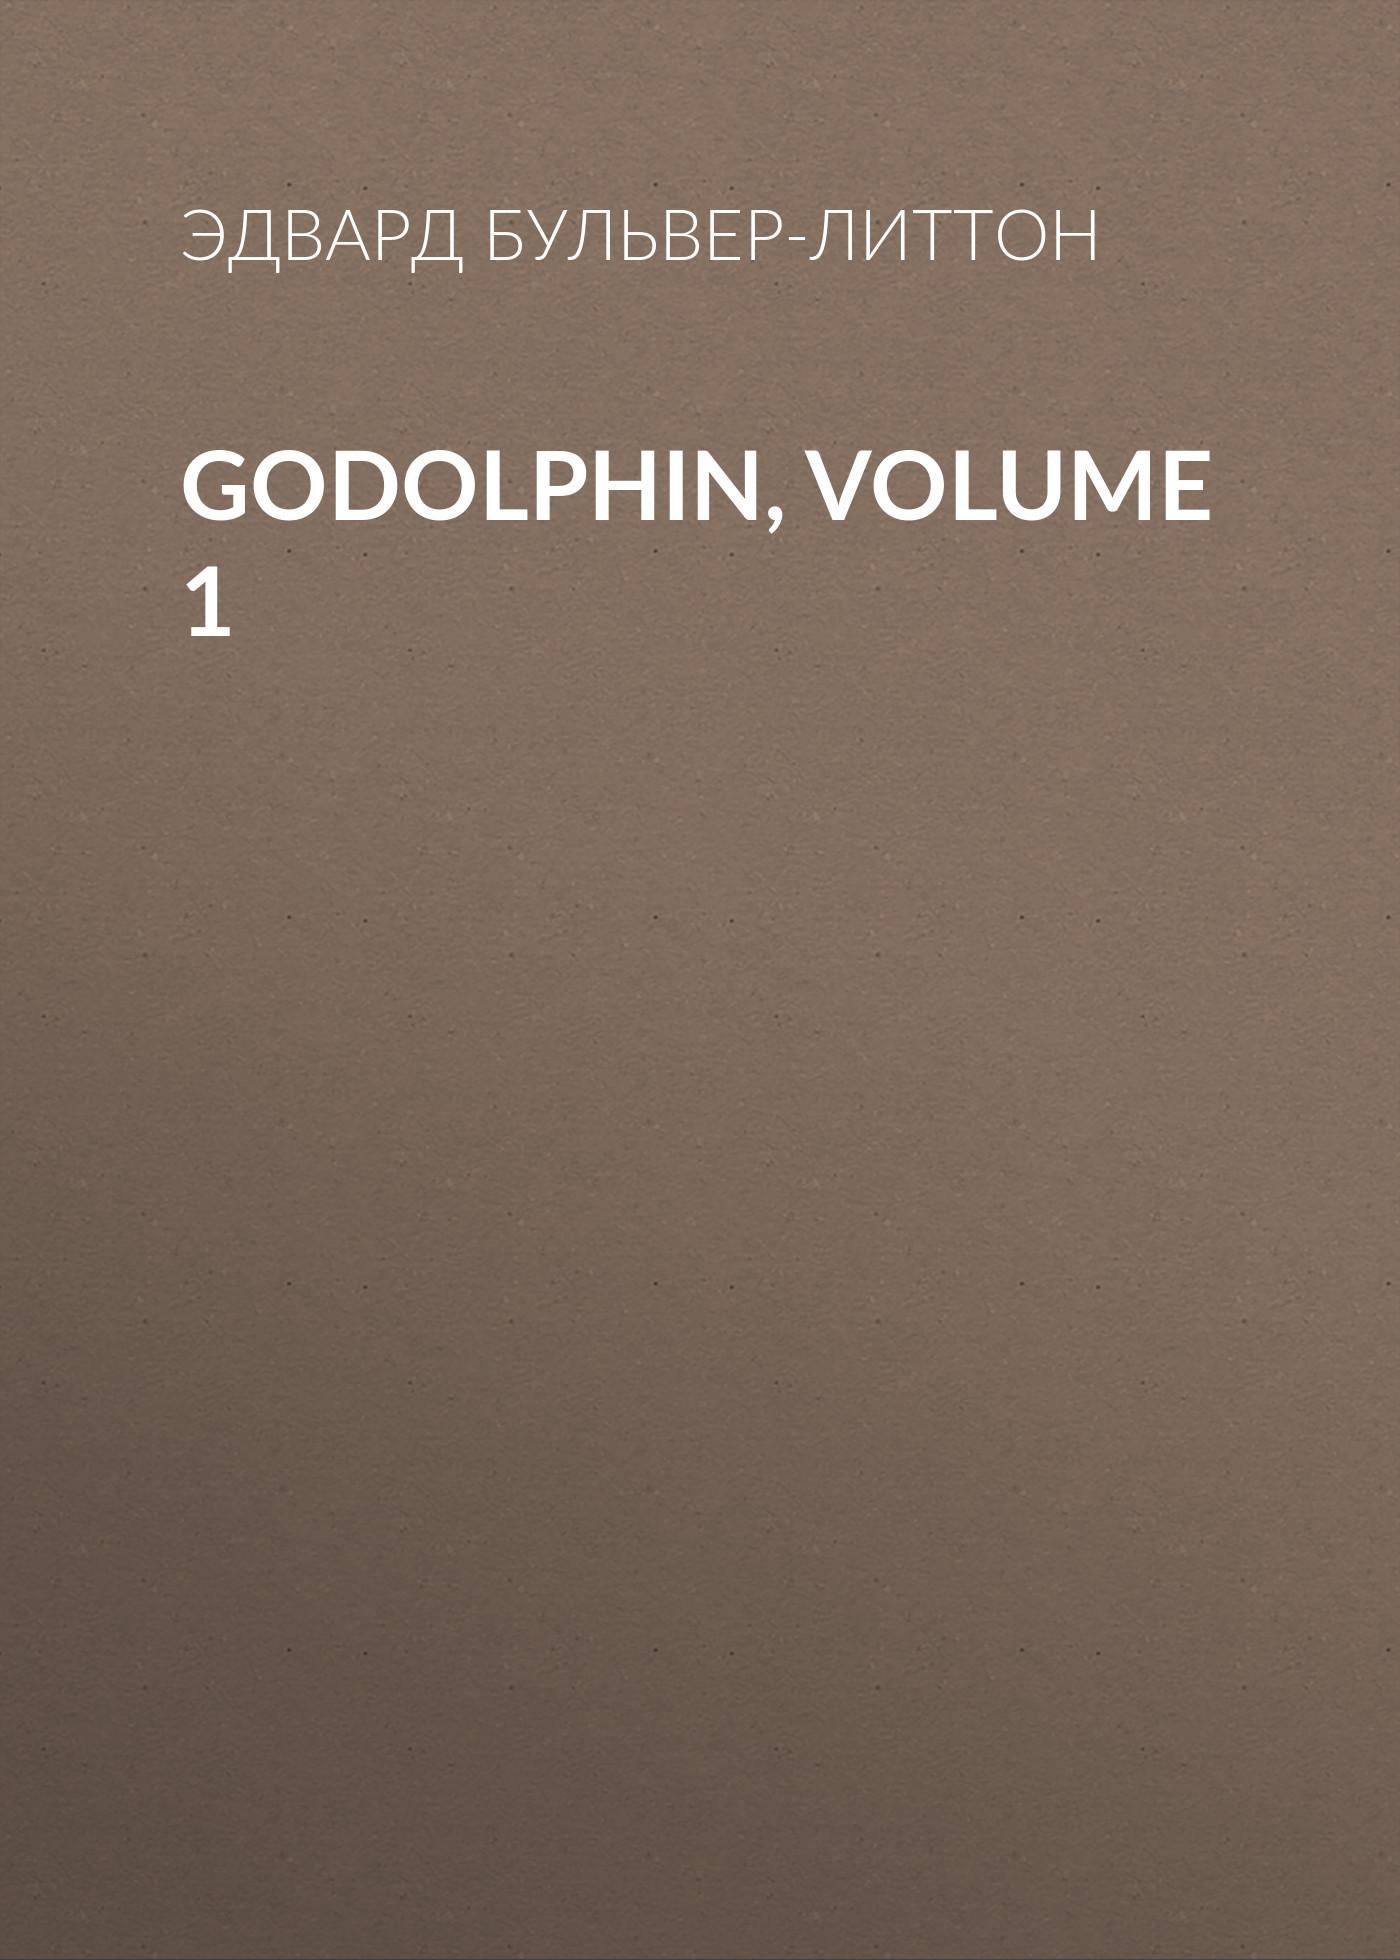 Эдвард Бульвер-Литтон Godolphin, Volume 1 j parker r algorithms for image processing and computer vision